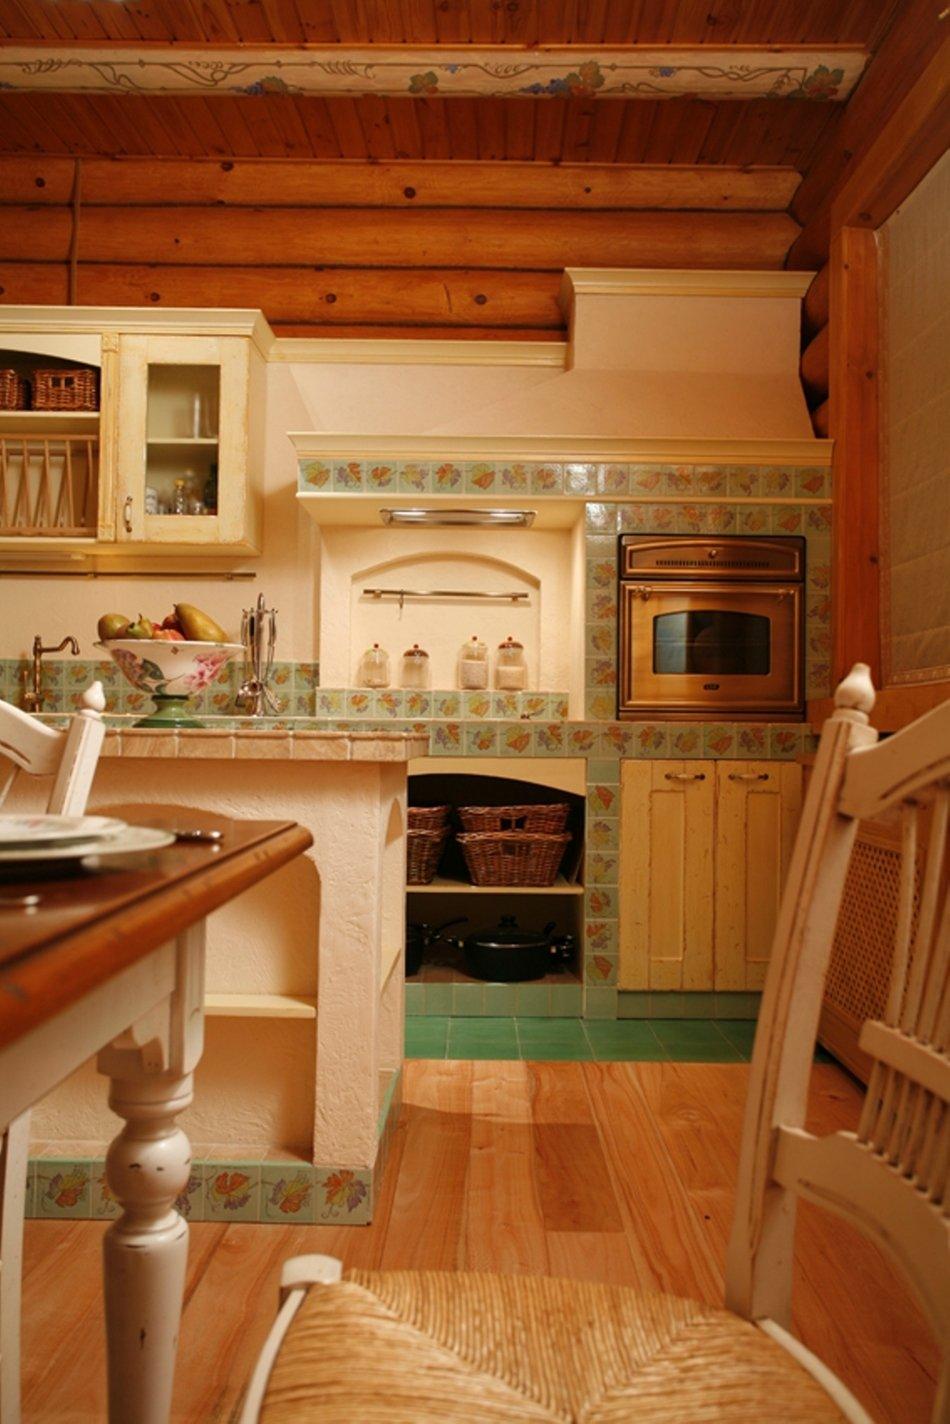 Идеи для кухни с печкой фото